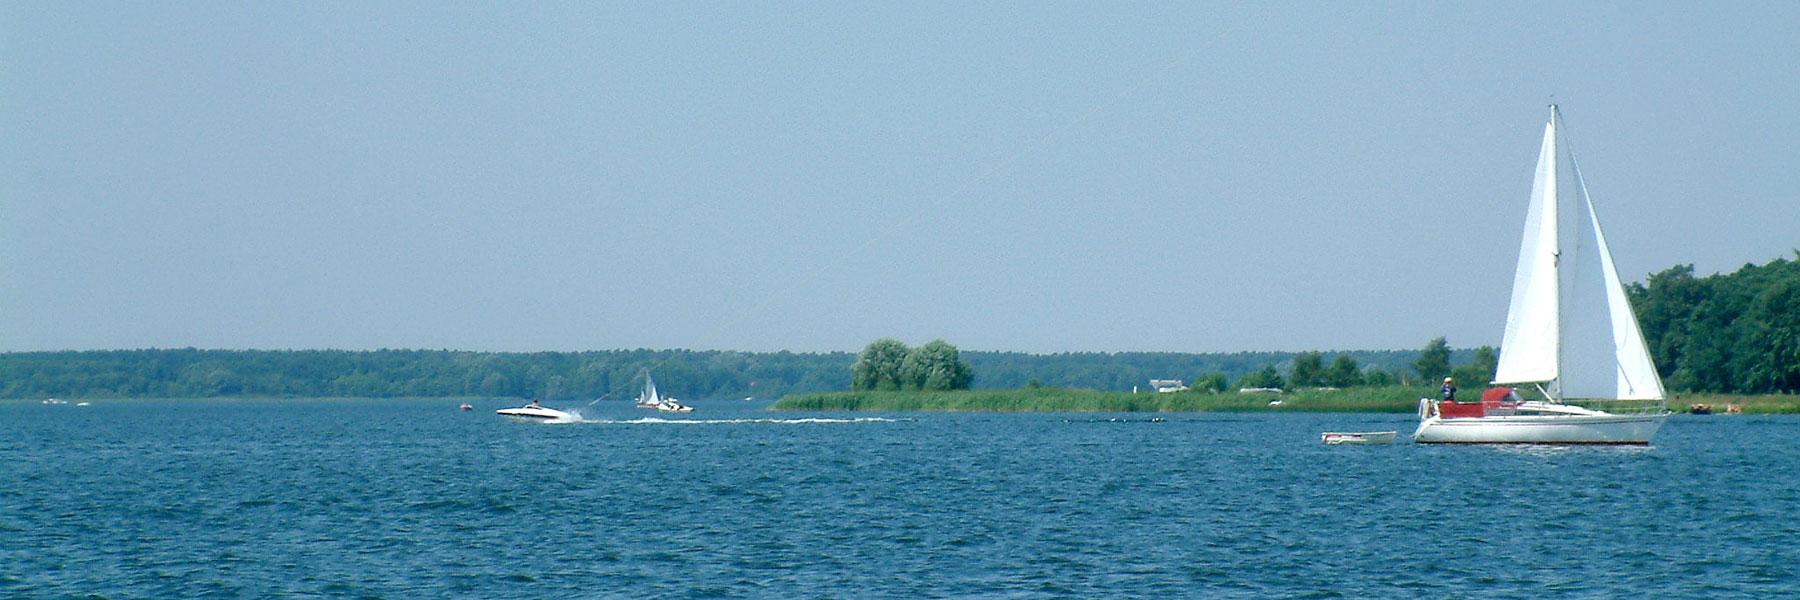 Plauer See - Ferienhäuser Pardun